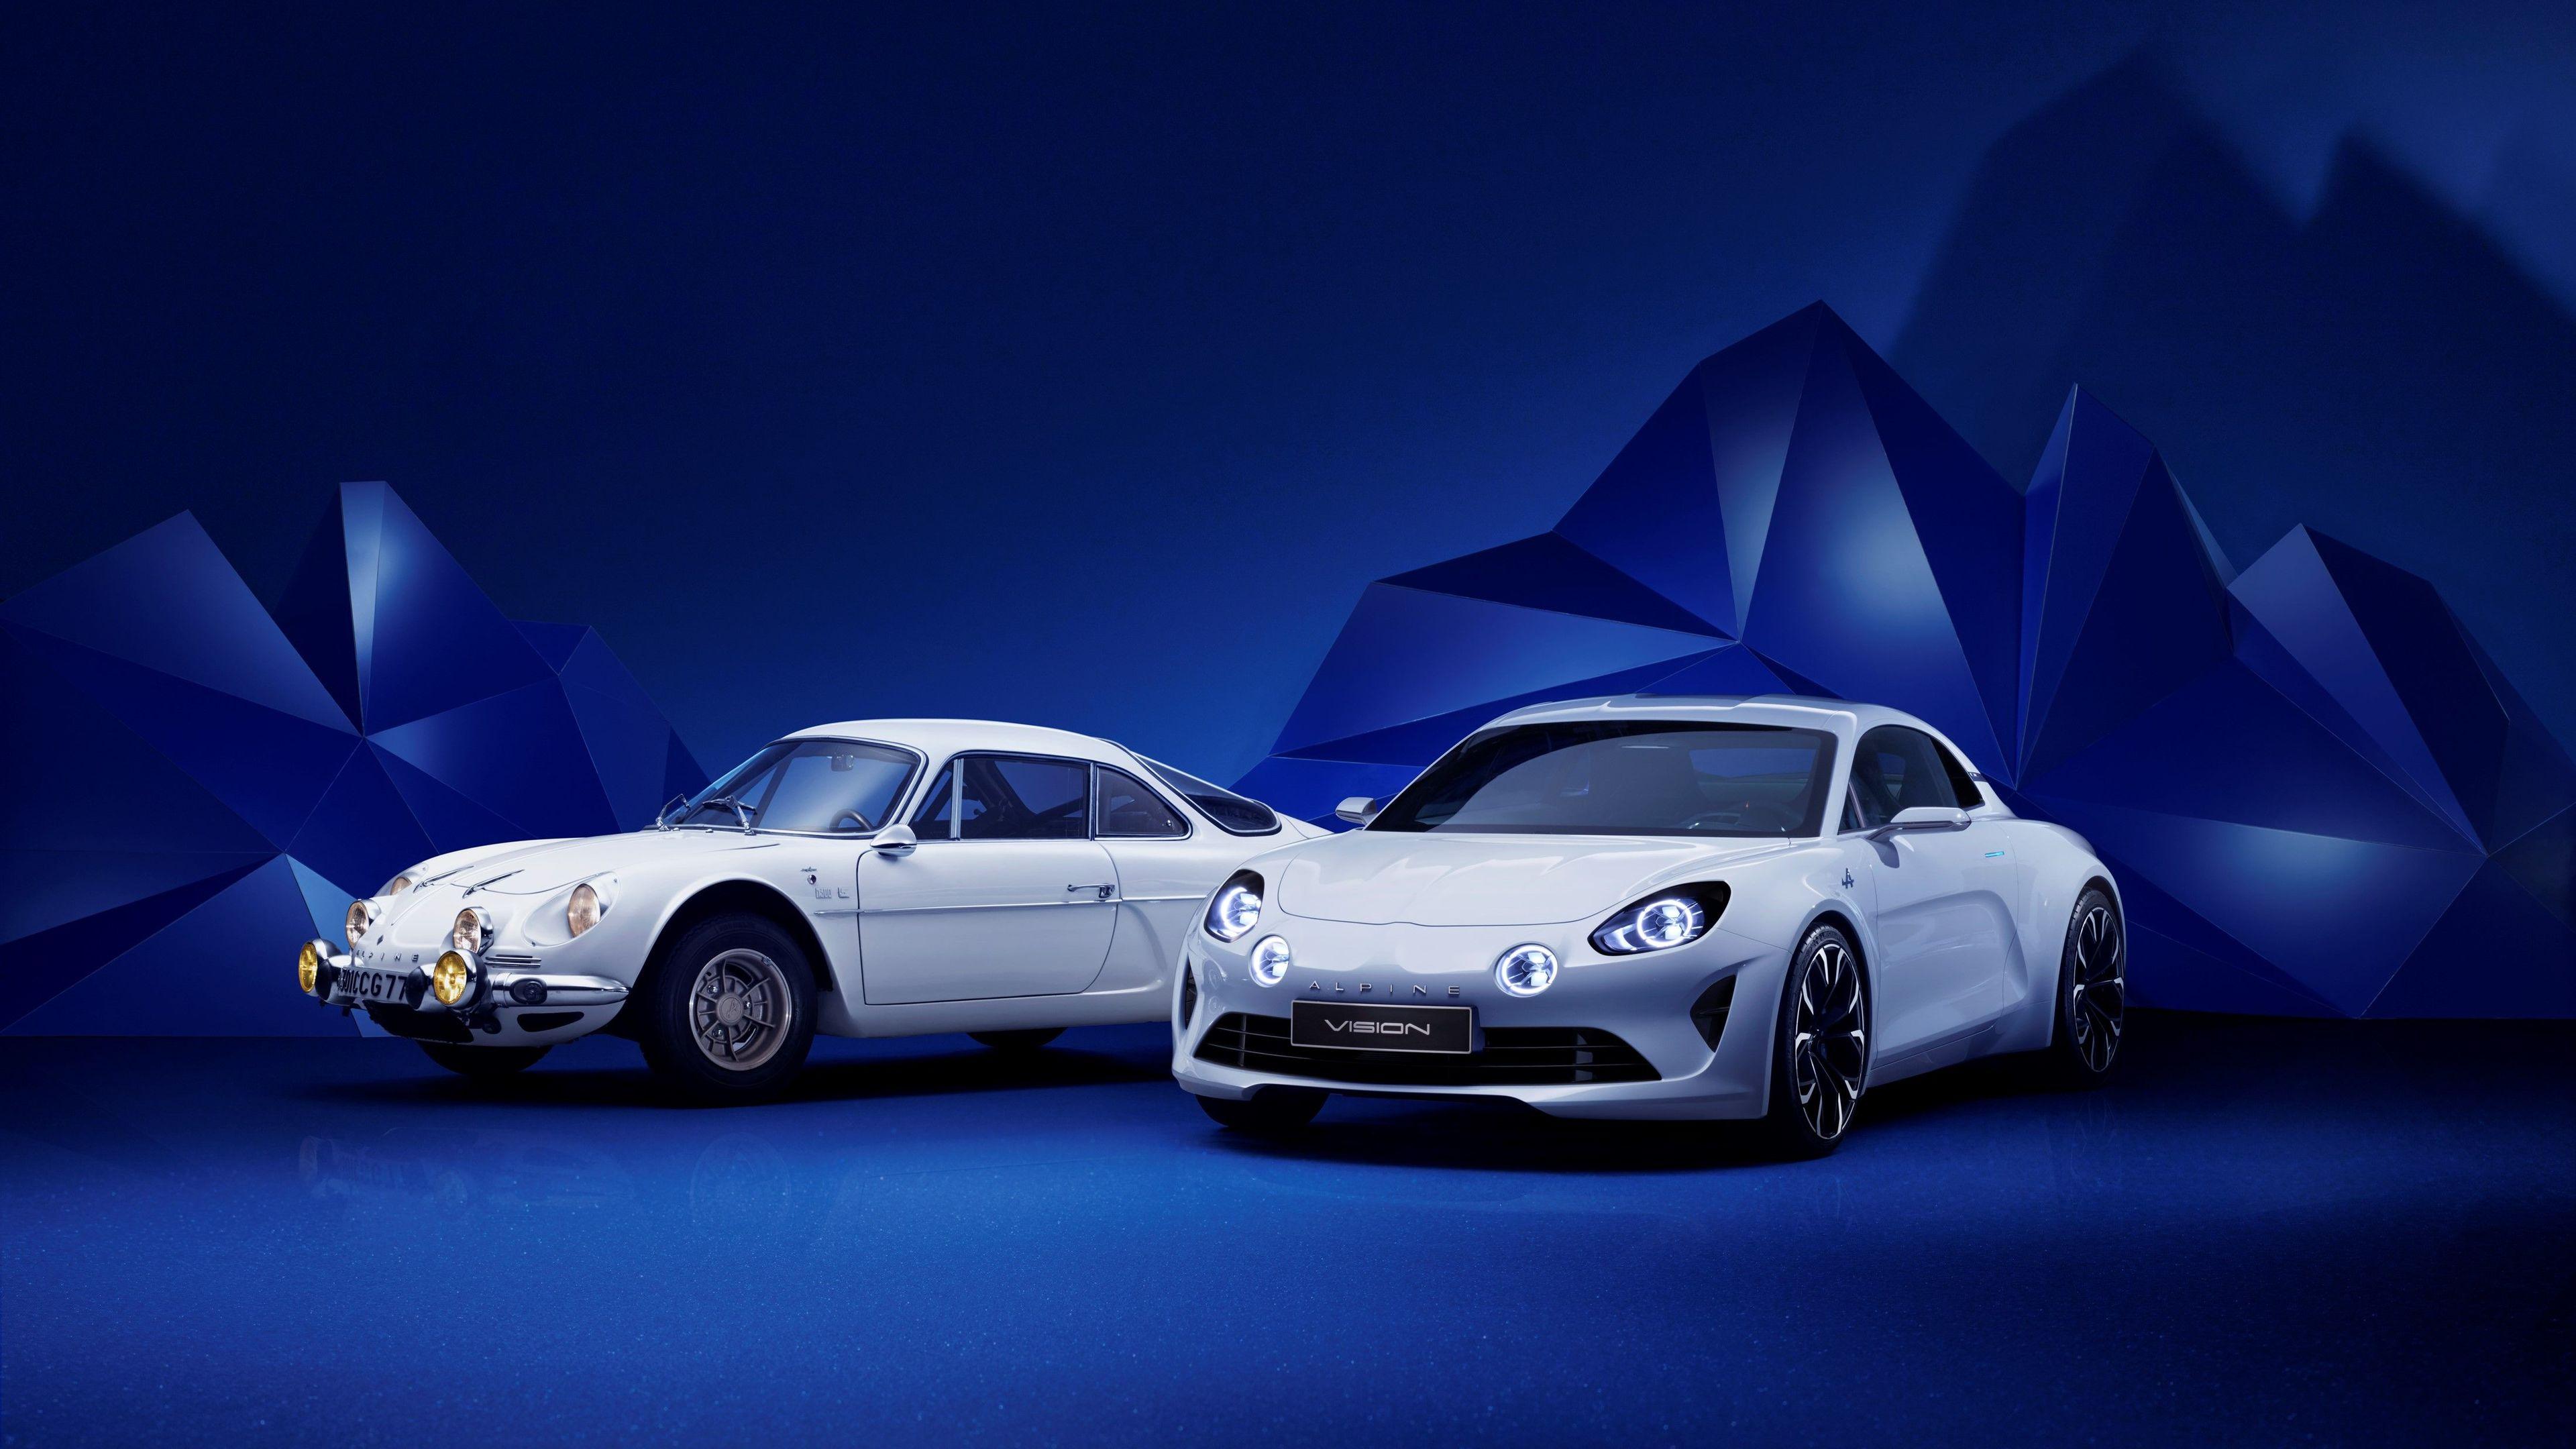 alpine cars 4k 1553075644 - Alpine Cars 4k - hd-wallpapers, cars wallpapers, alpine wallpapers, 4k-wallpapers